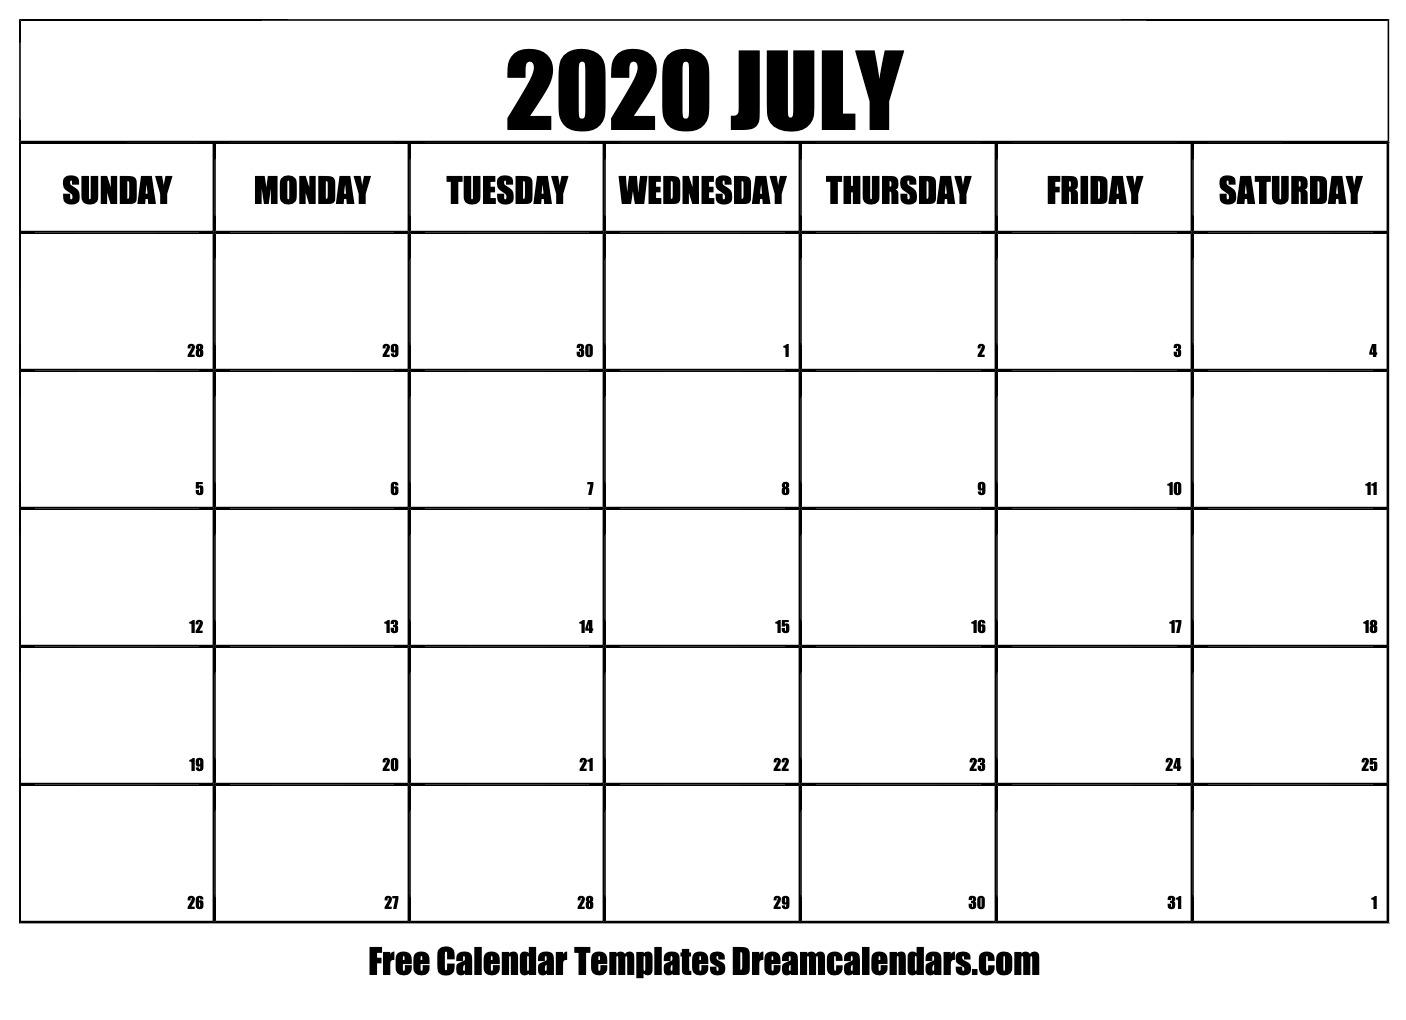 Printable July 2020 Calendar regarding Free Template 2020 Sunday To Saturday Calendar